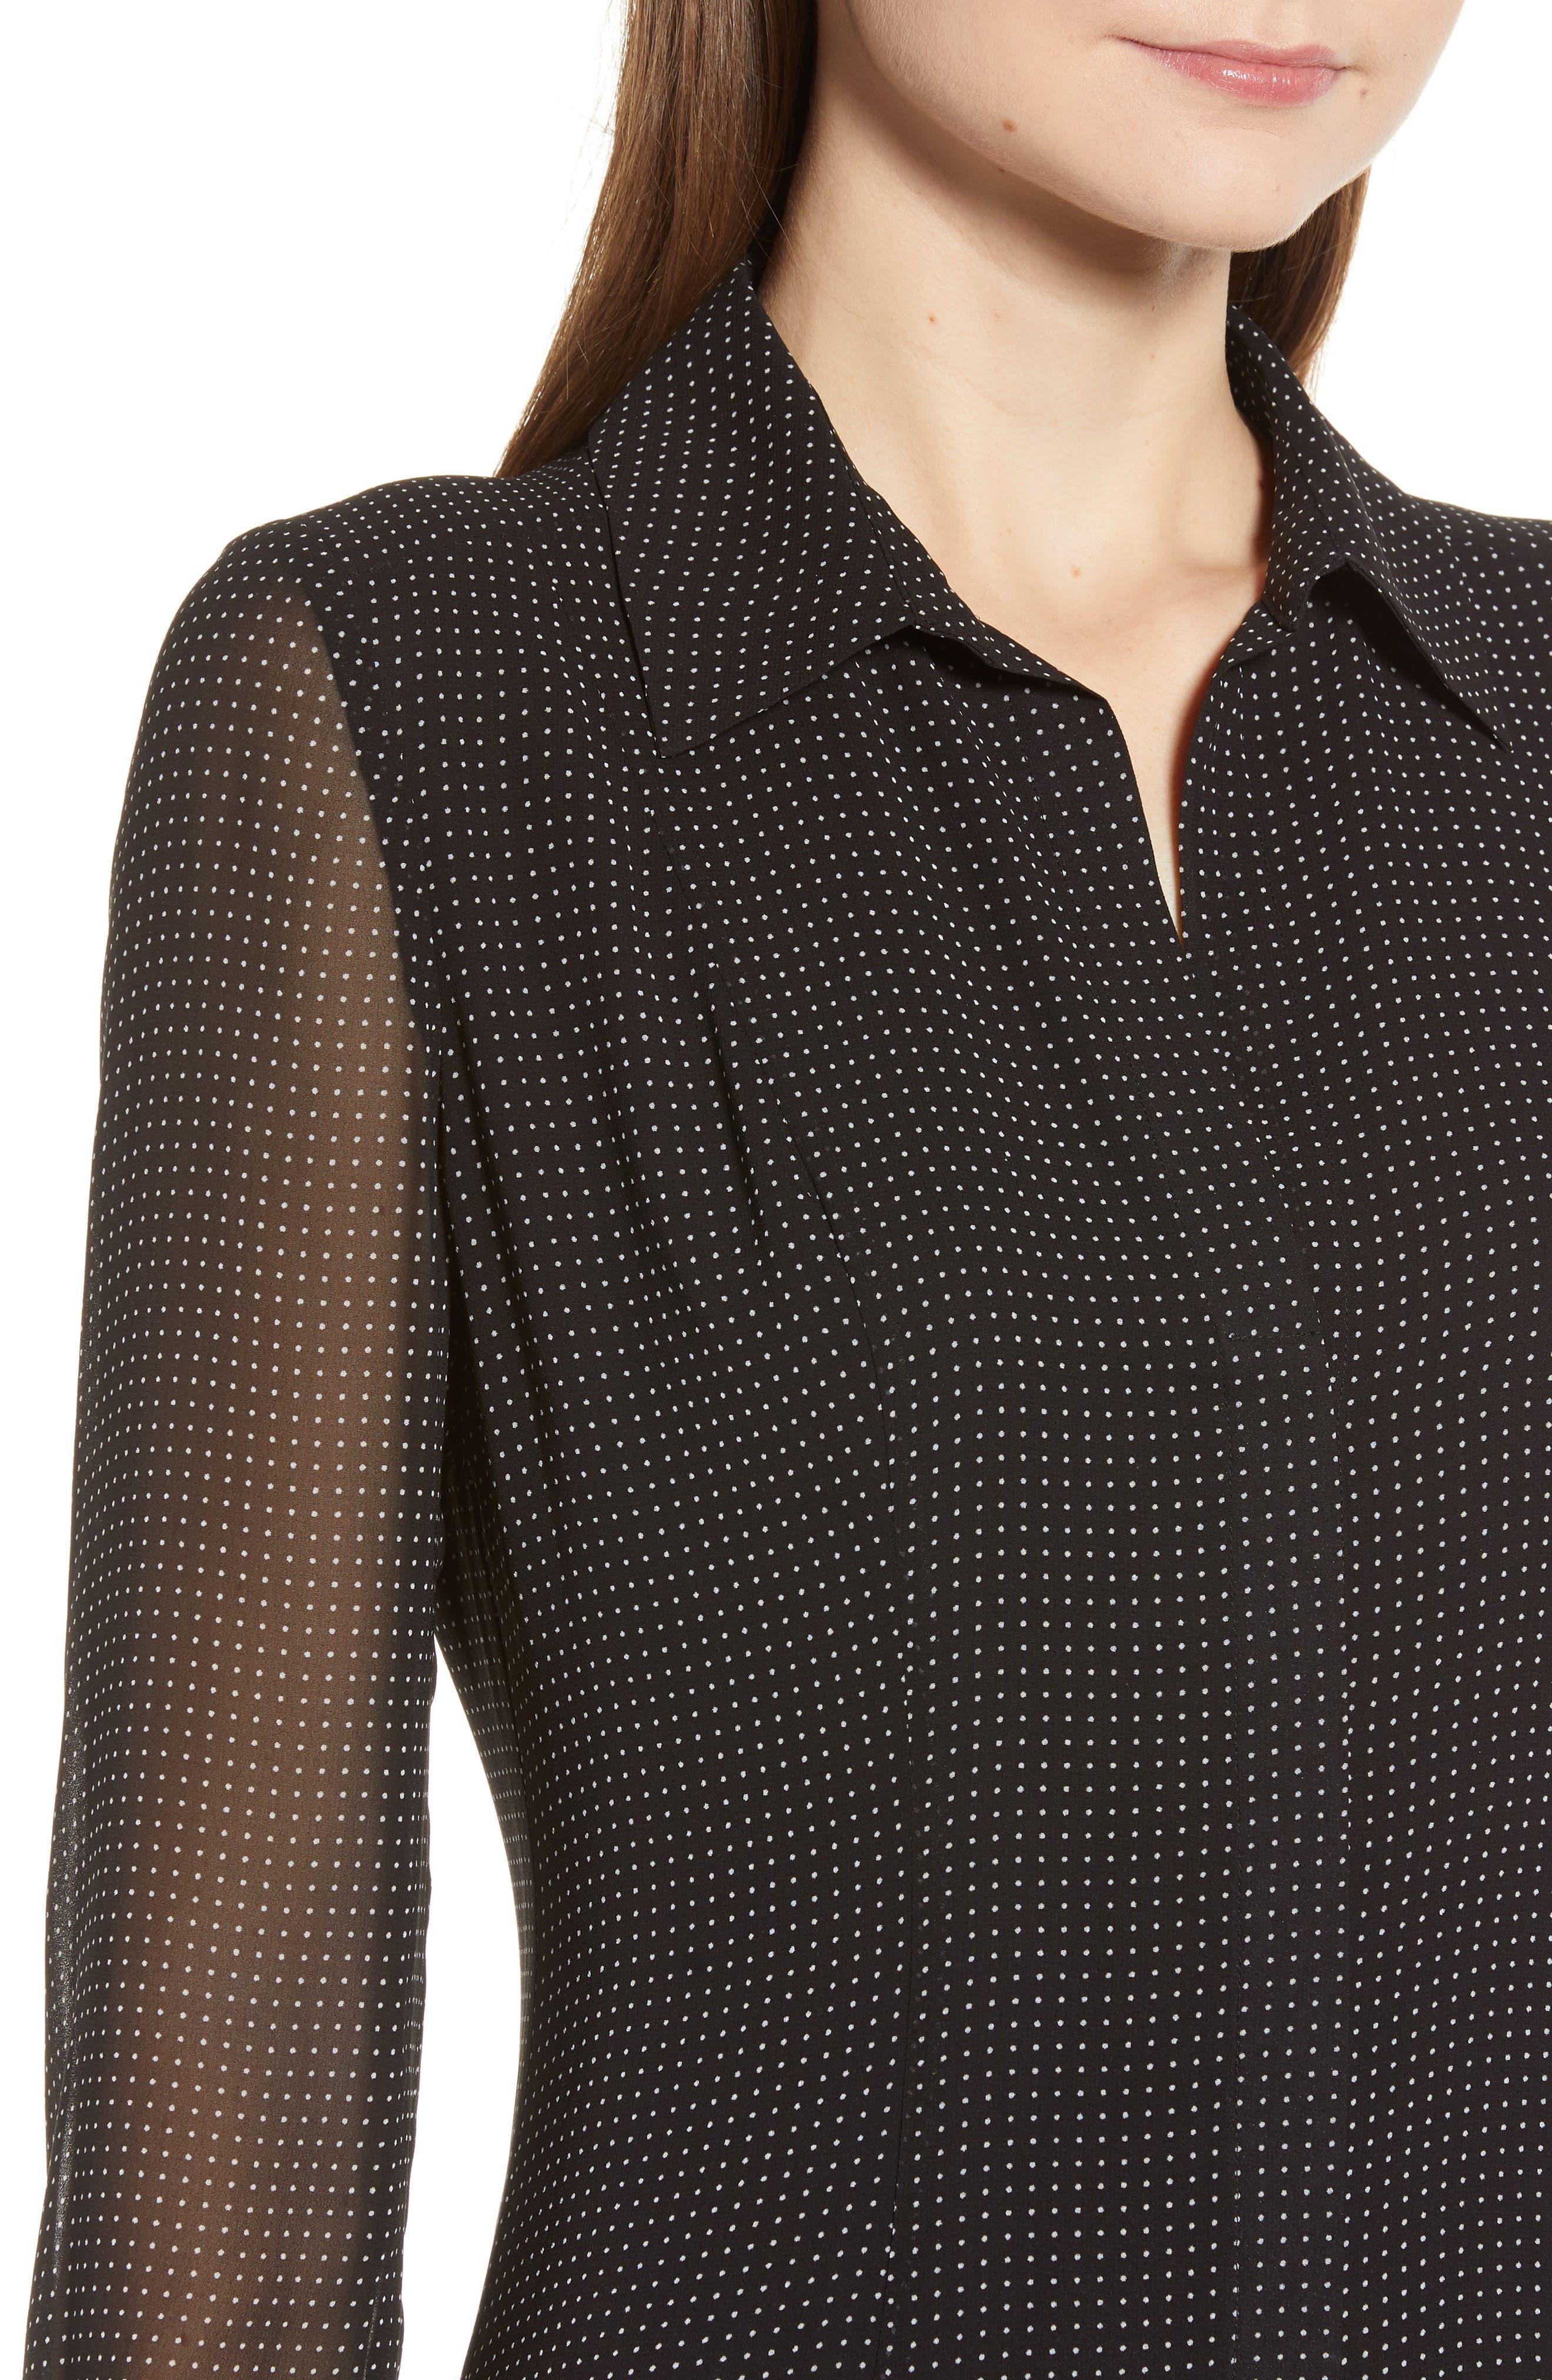 REBECCA MINKOFF,                             Kimberly Dot Sheer Sleeve Dress,                             Alternate thumbnail 5, color,                             BLACK/ WHITE